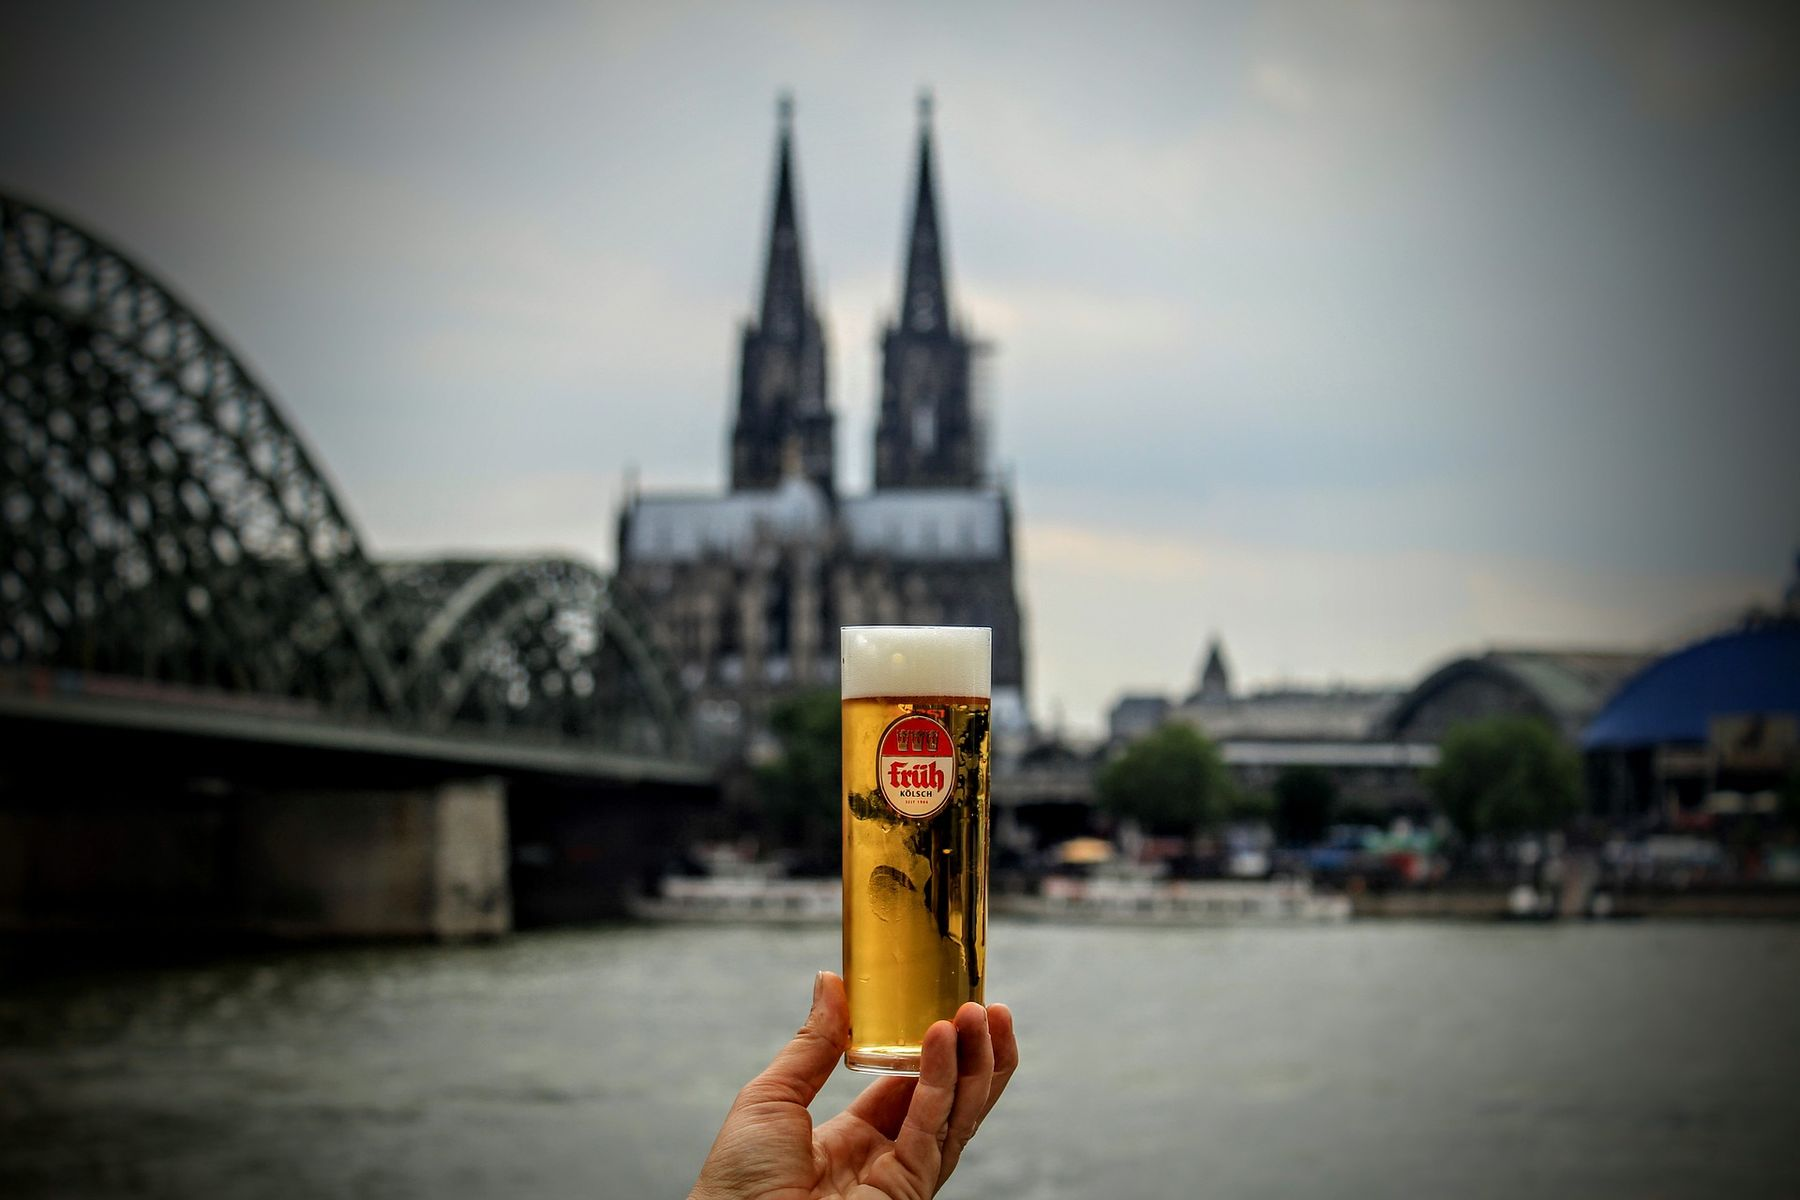 Kölsch trinken in Köln